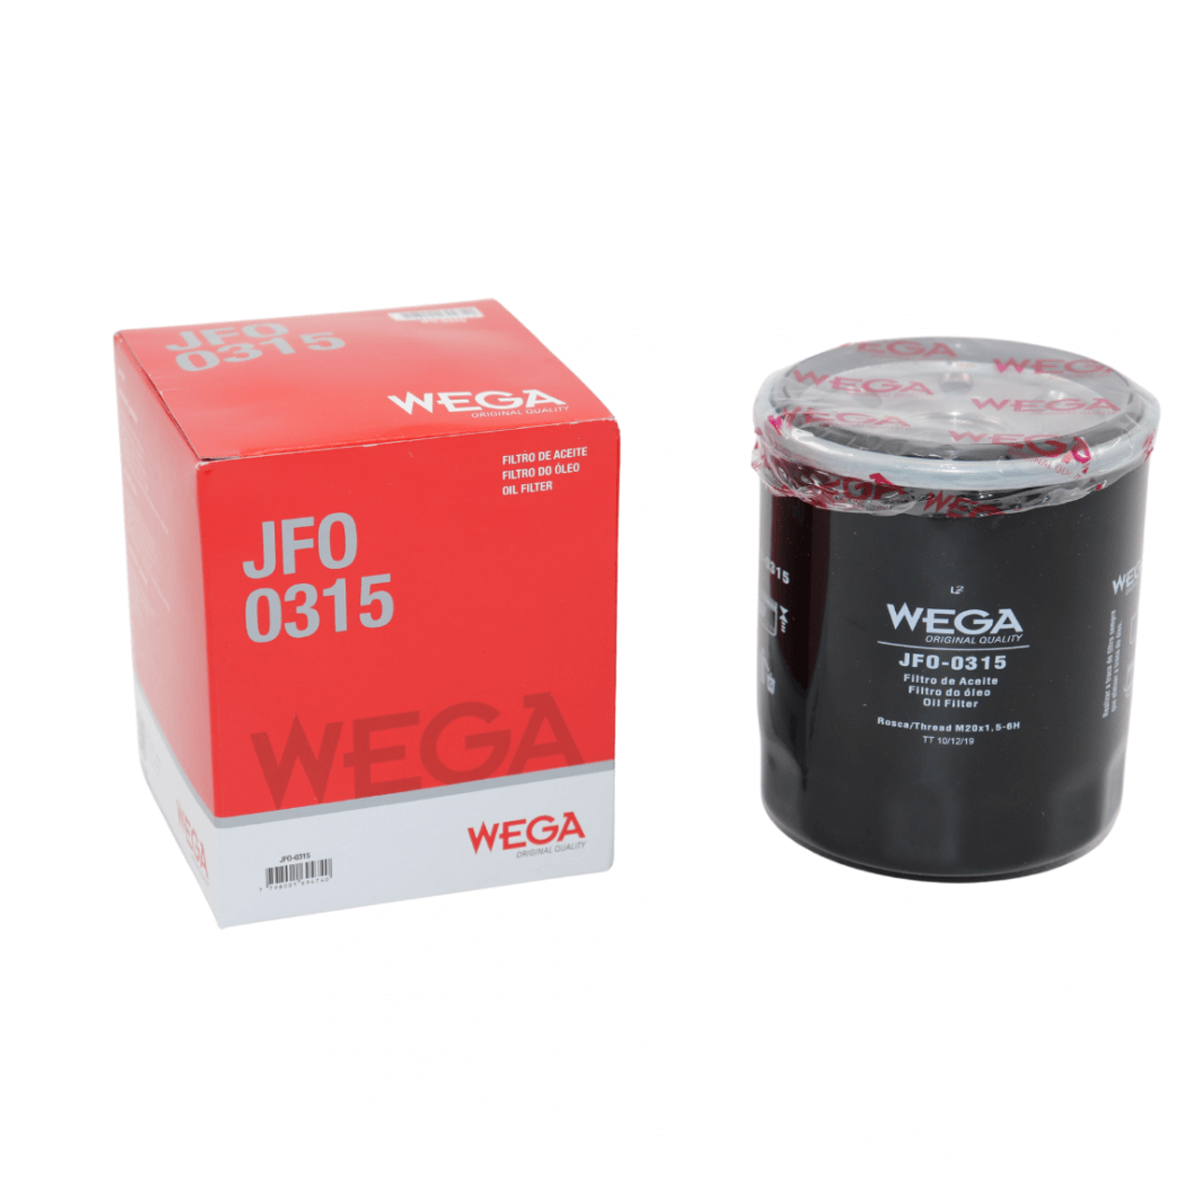 Filtro de Oleo Wega JFO0315 / Tecfil PSL130 em até 6x sem juros